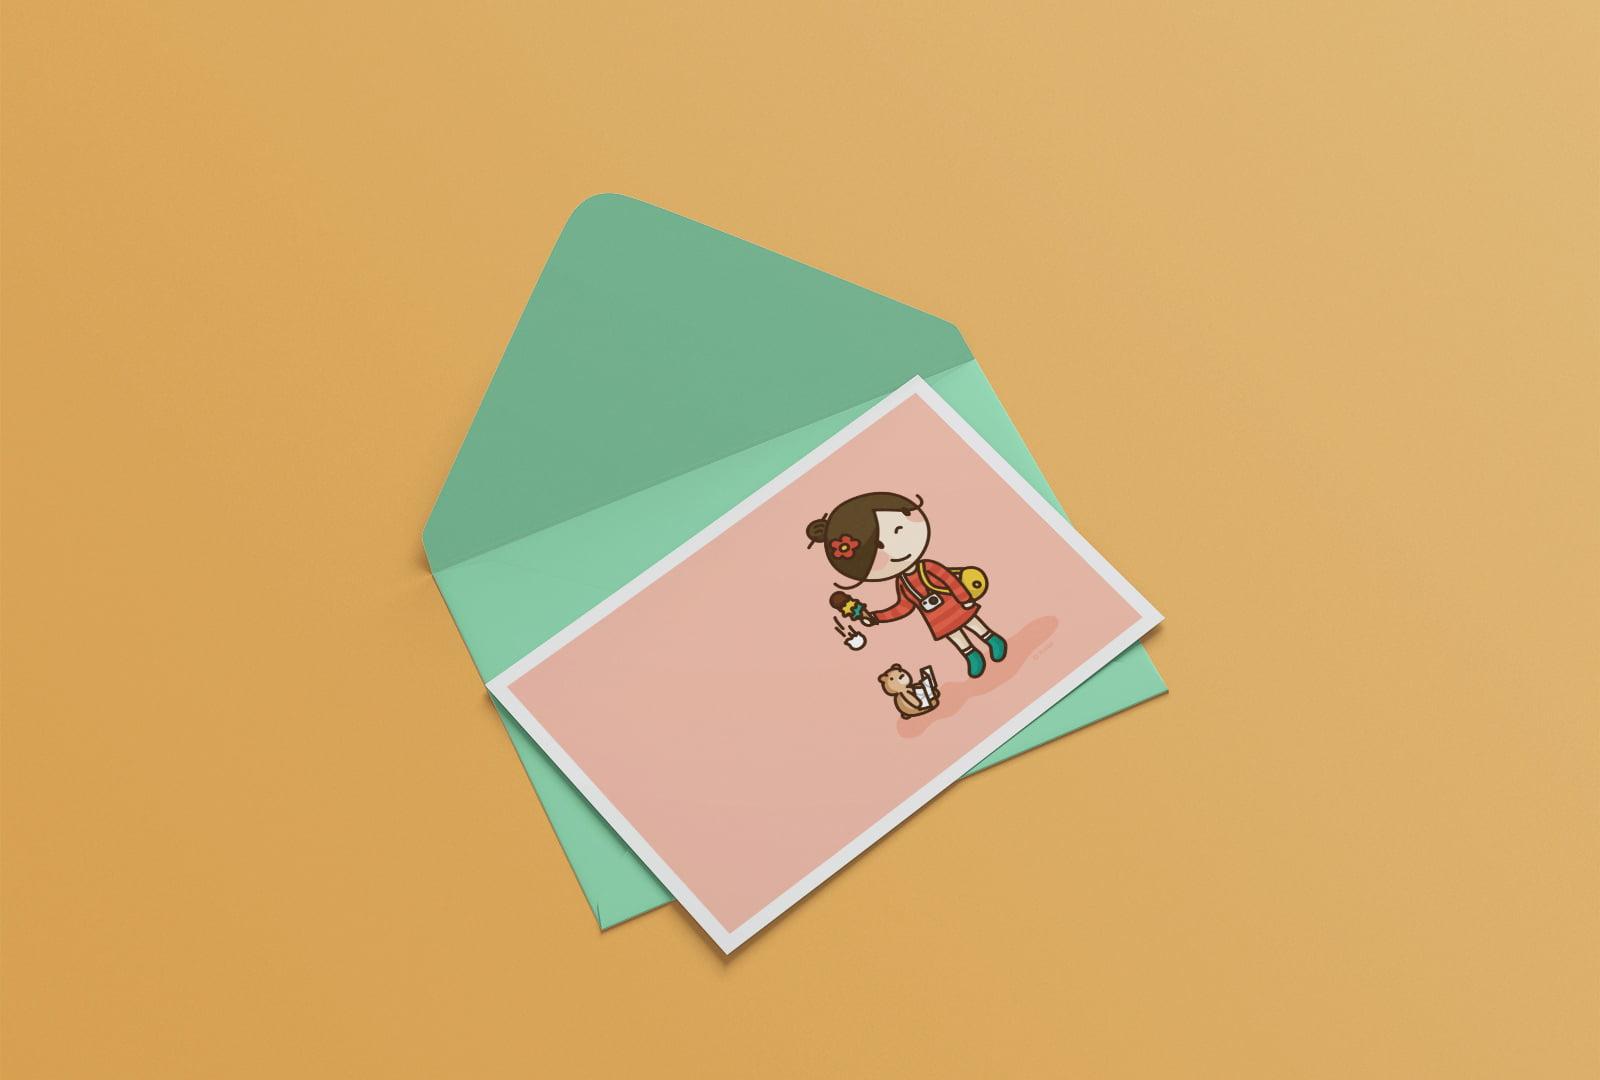 kourami-piki-macaron-postcard-2